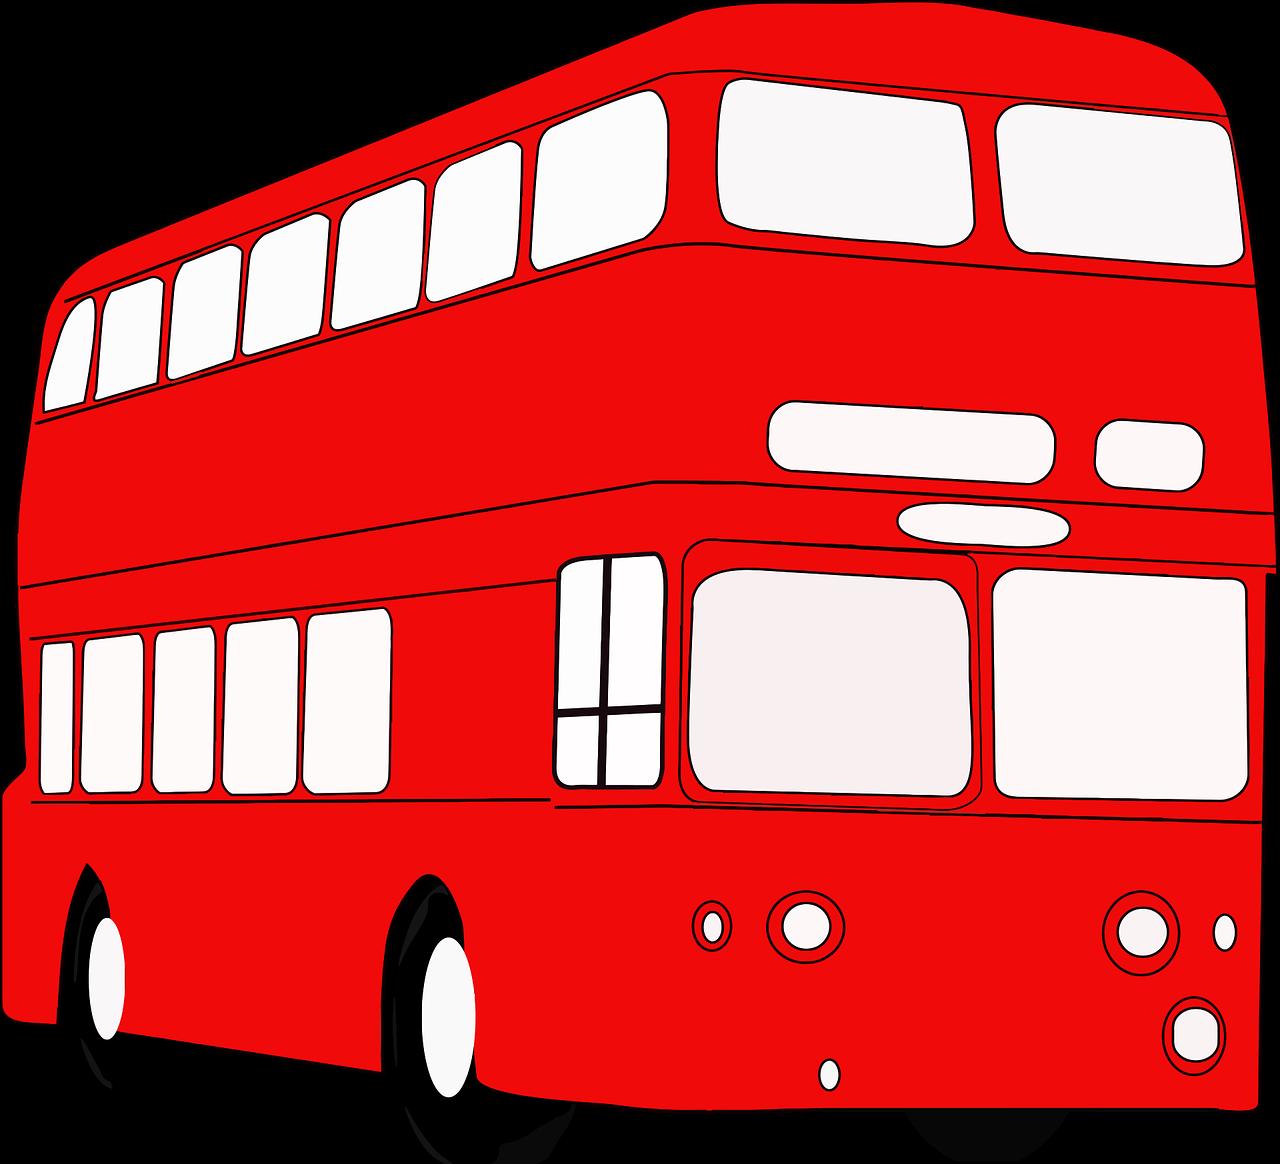 British Bus Double Decker - Free vector graphic on Pixabay